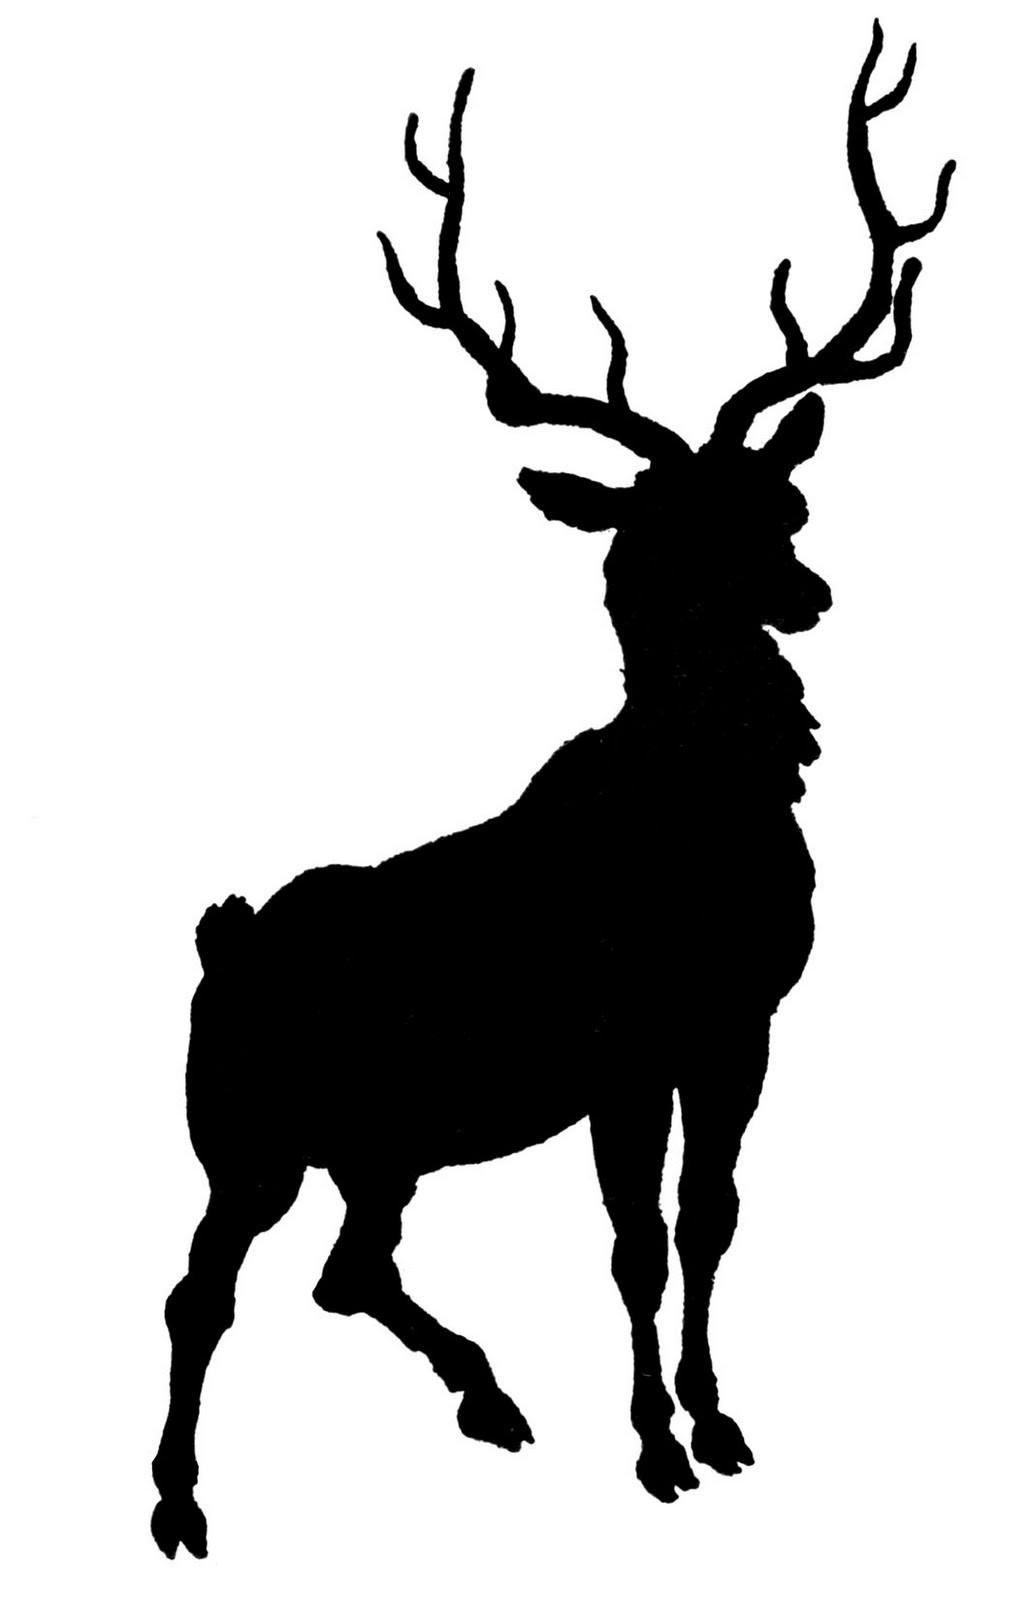 1032x1600 Images For Mule Deer Silhouette Clip Art Silhouettes Fair Stencil